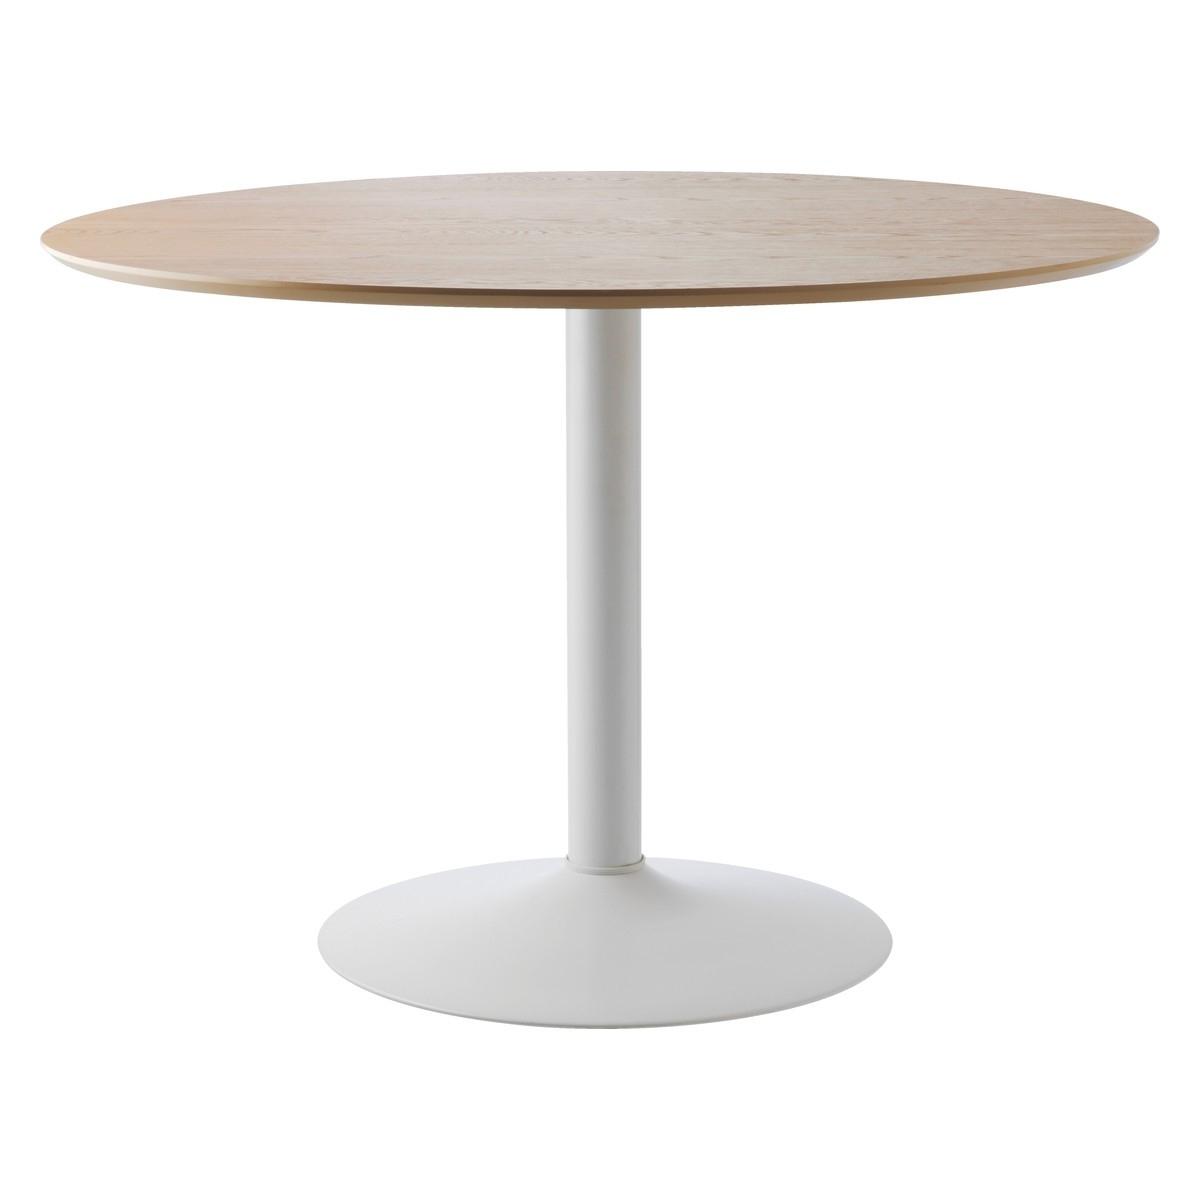 2017 Lance 4 Seater Oak Veneer Round Dining Table